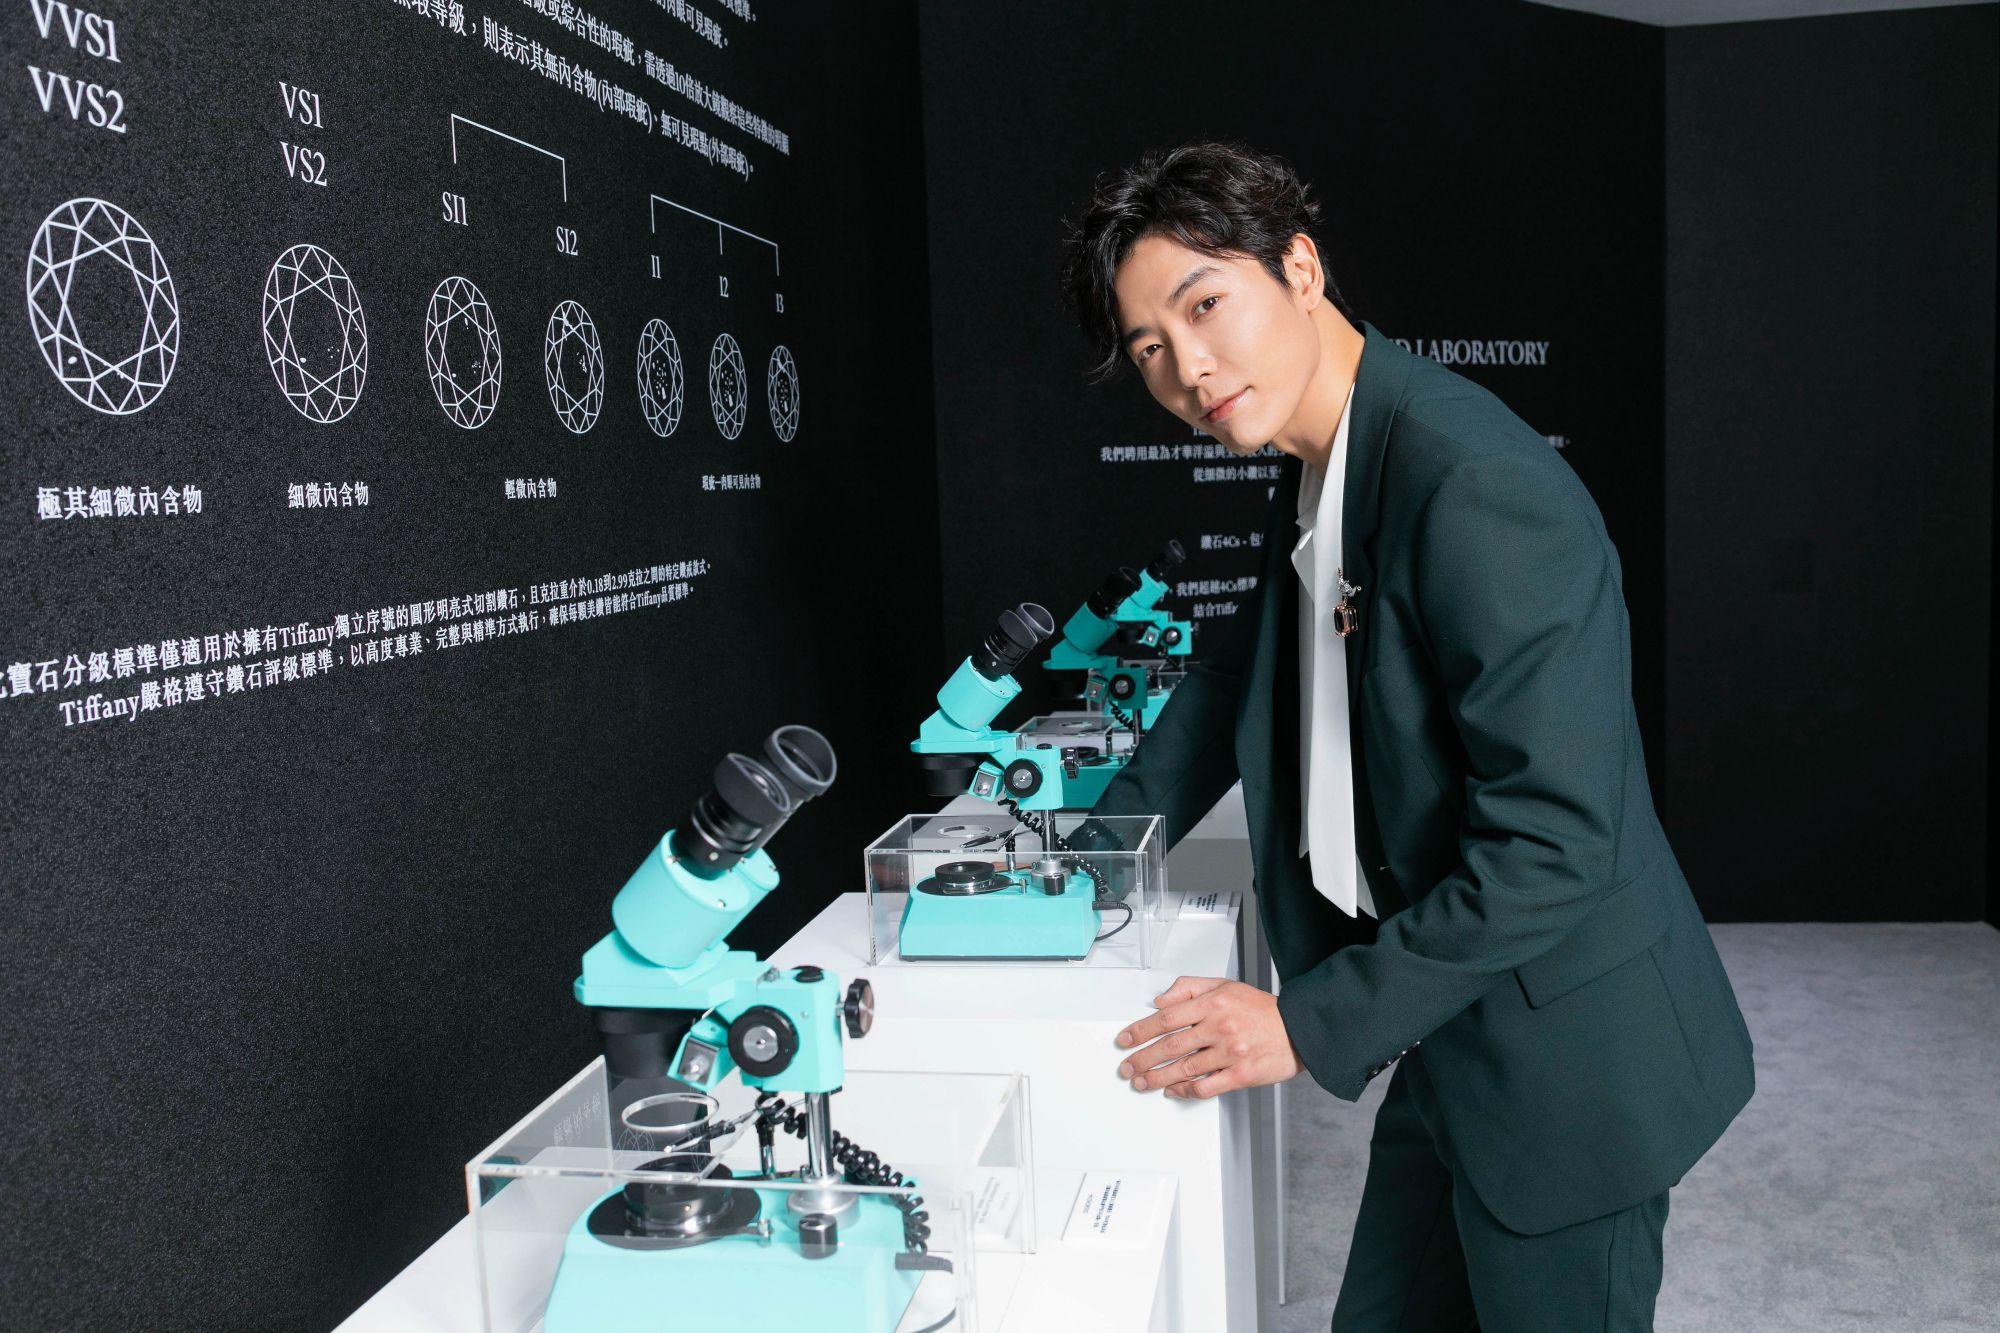 「Tiffany美鑽傳奇主題展」華山限時登場!韓國男神金材昱抵台,帶你一起走入Tiffany的鑽石世界